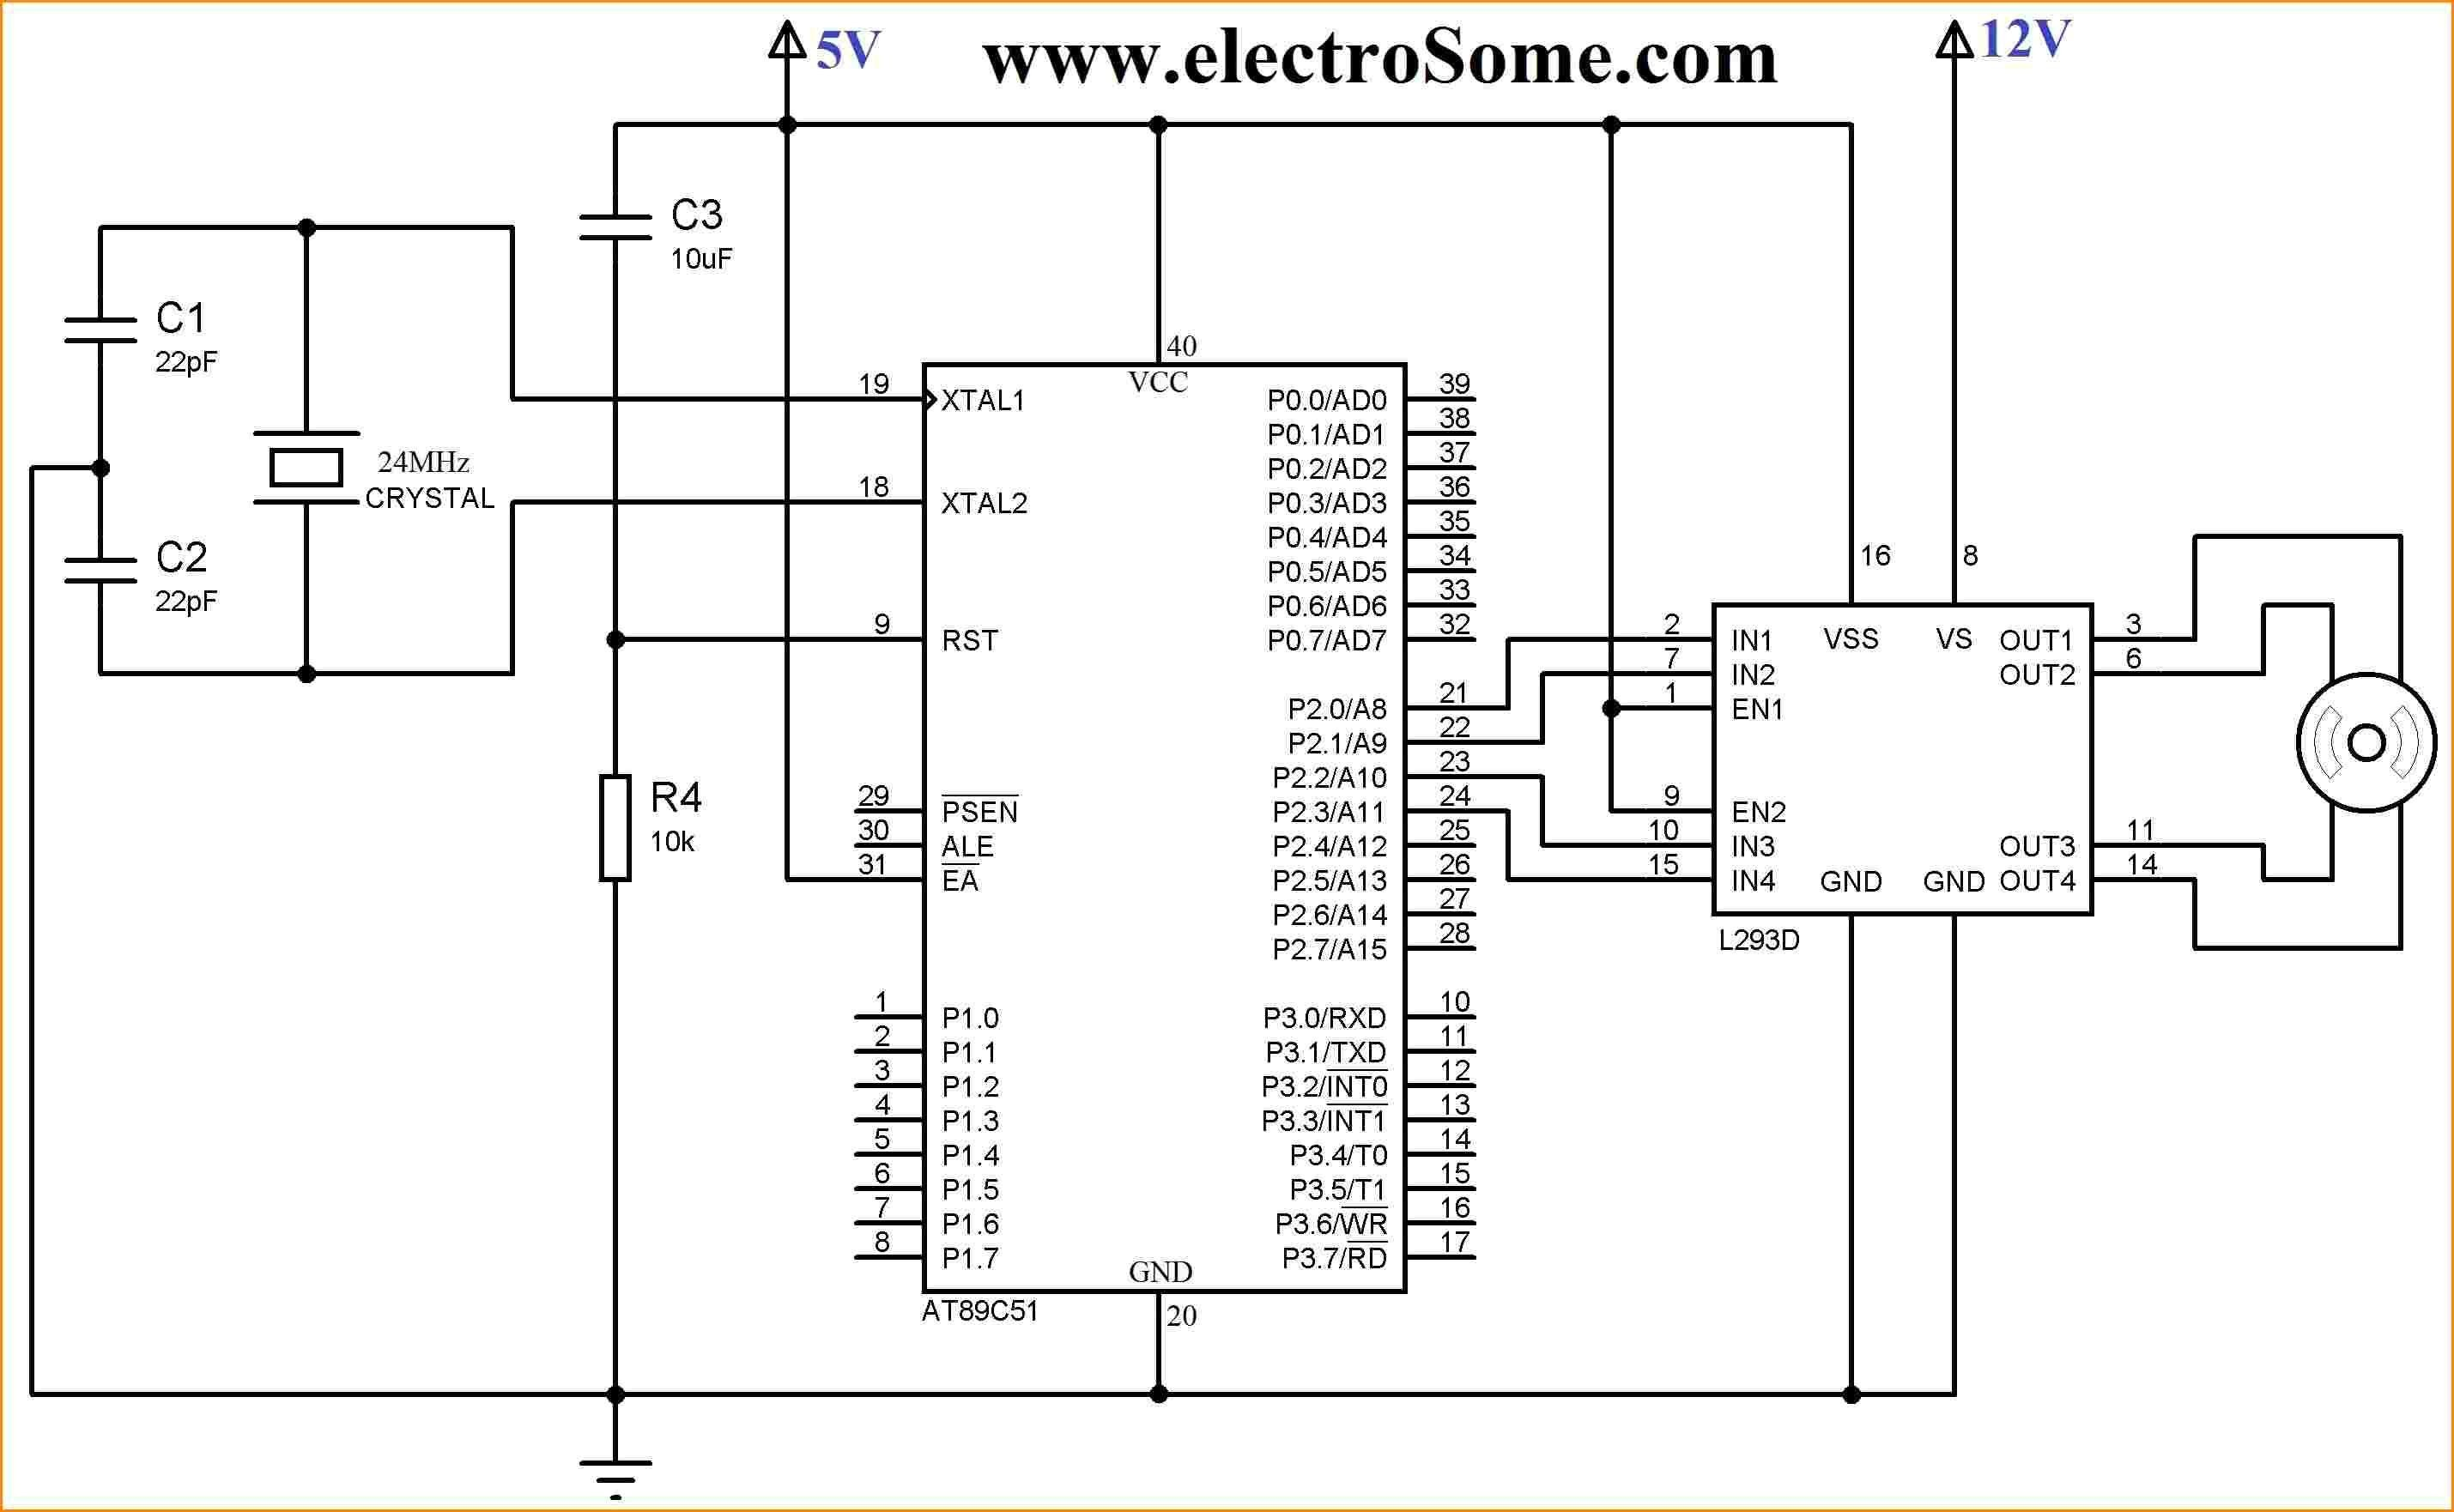 Cctv Balun Wiring Diagram Cctv Camera Wiring Diagram Image Of Cctv Balun Wiring Diagram